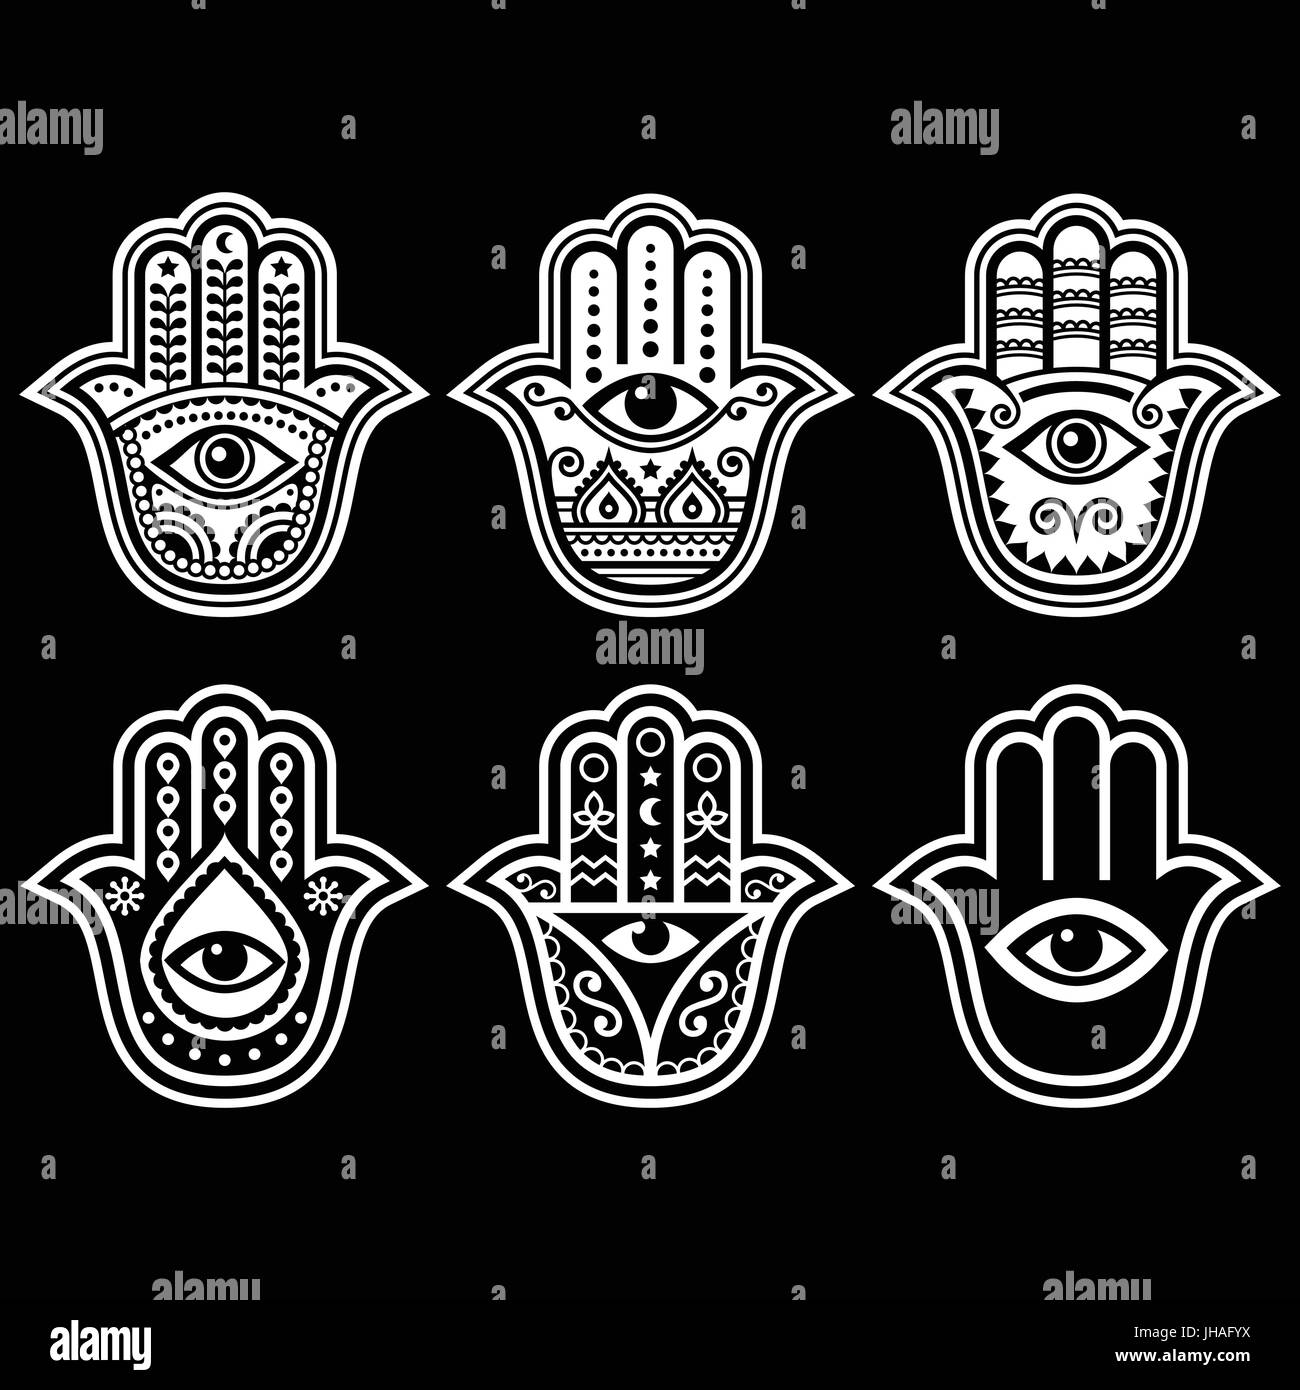 Hamsa hand hand of fatima amulet symbol of protection from hamsa hand hand of fatima amulet symbol of protection from devil eye on black hamsa hand of fatima symbol of strength and happiness isolated biocorpaavc